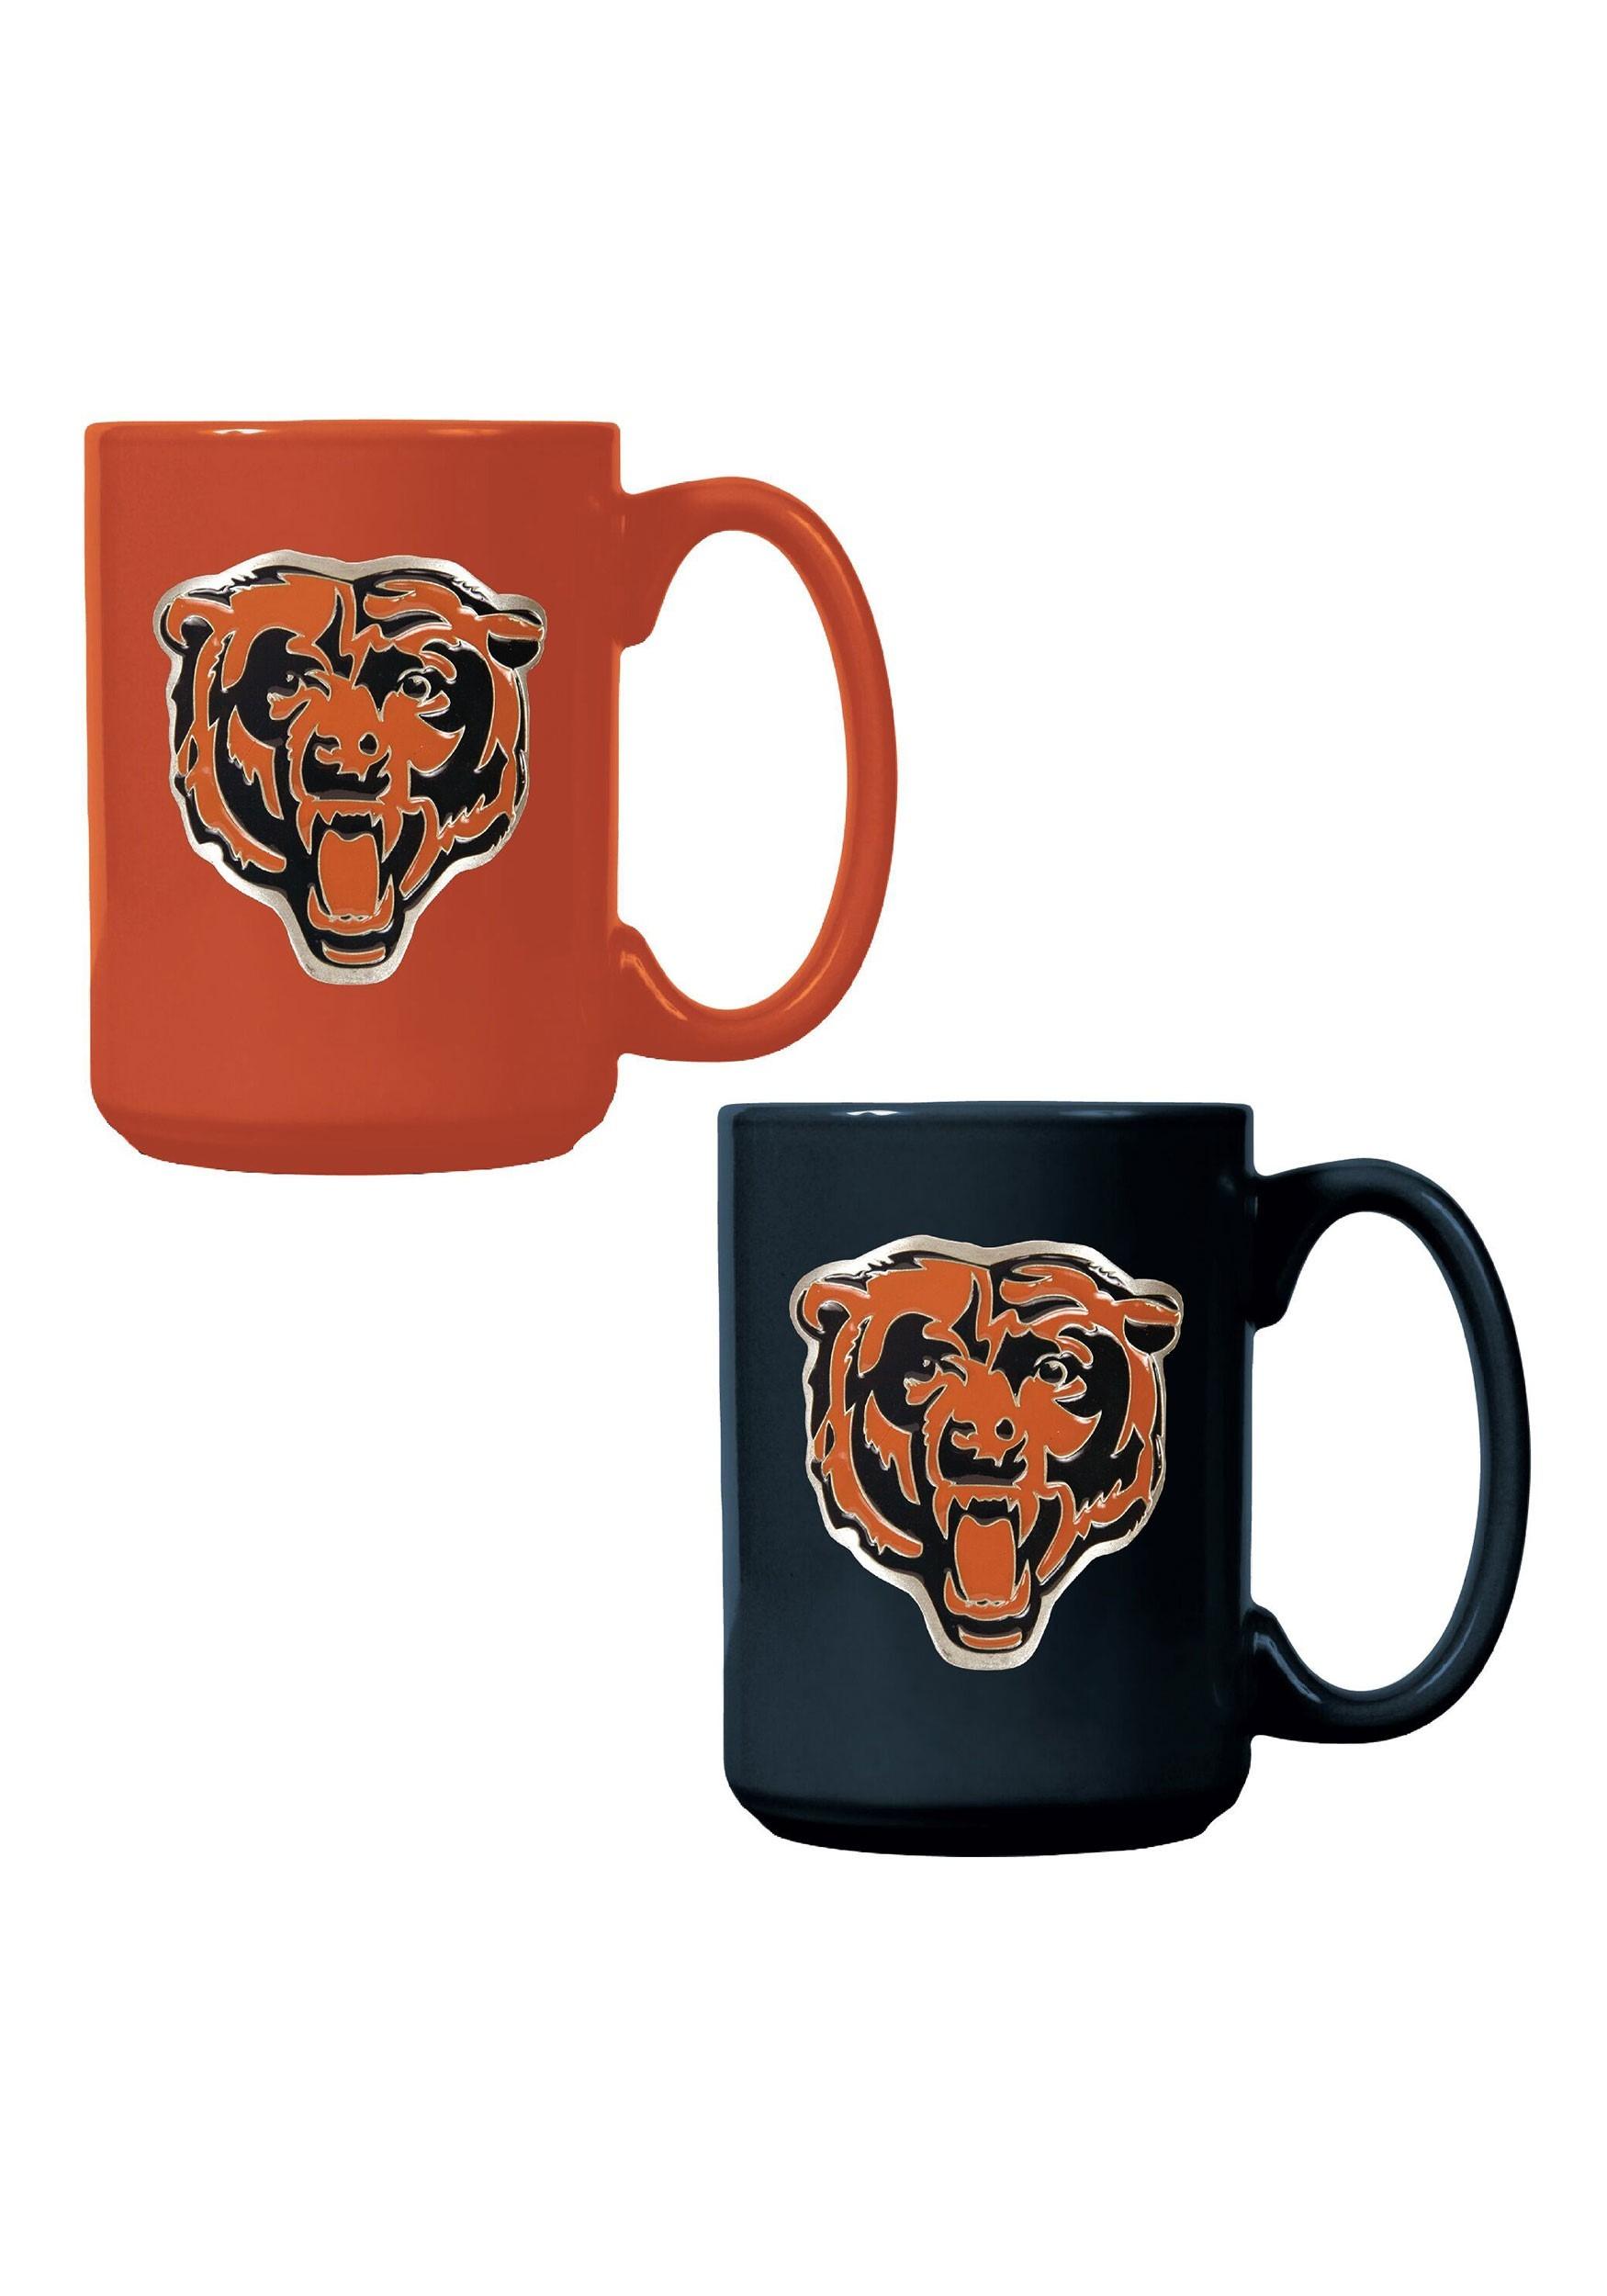 Chicago Bears NFL 15oz. Ceramic Mug Gift Set